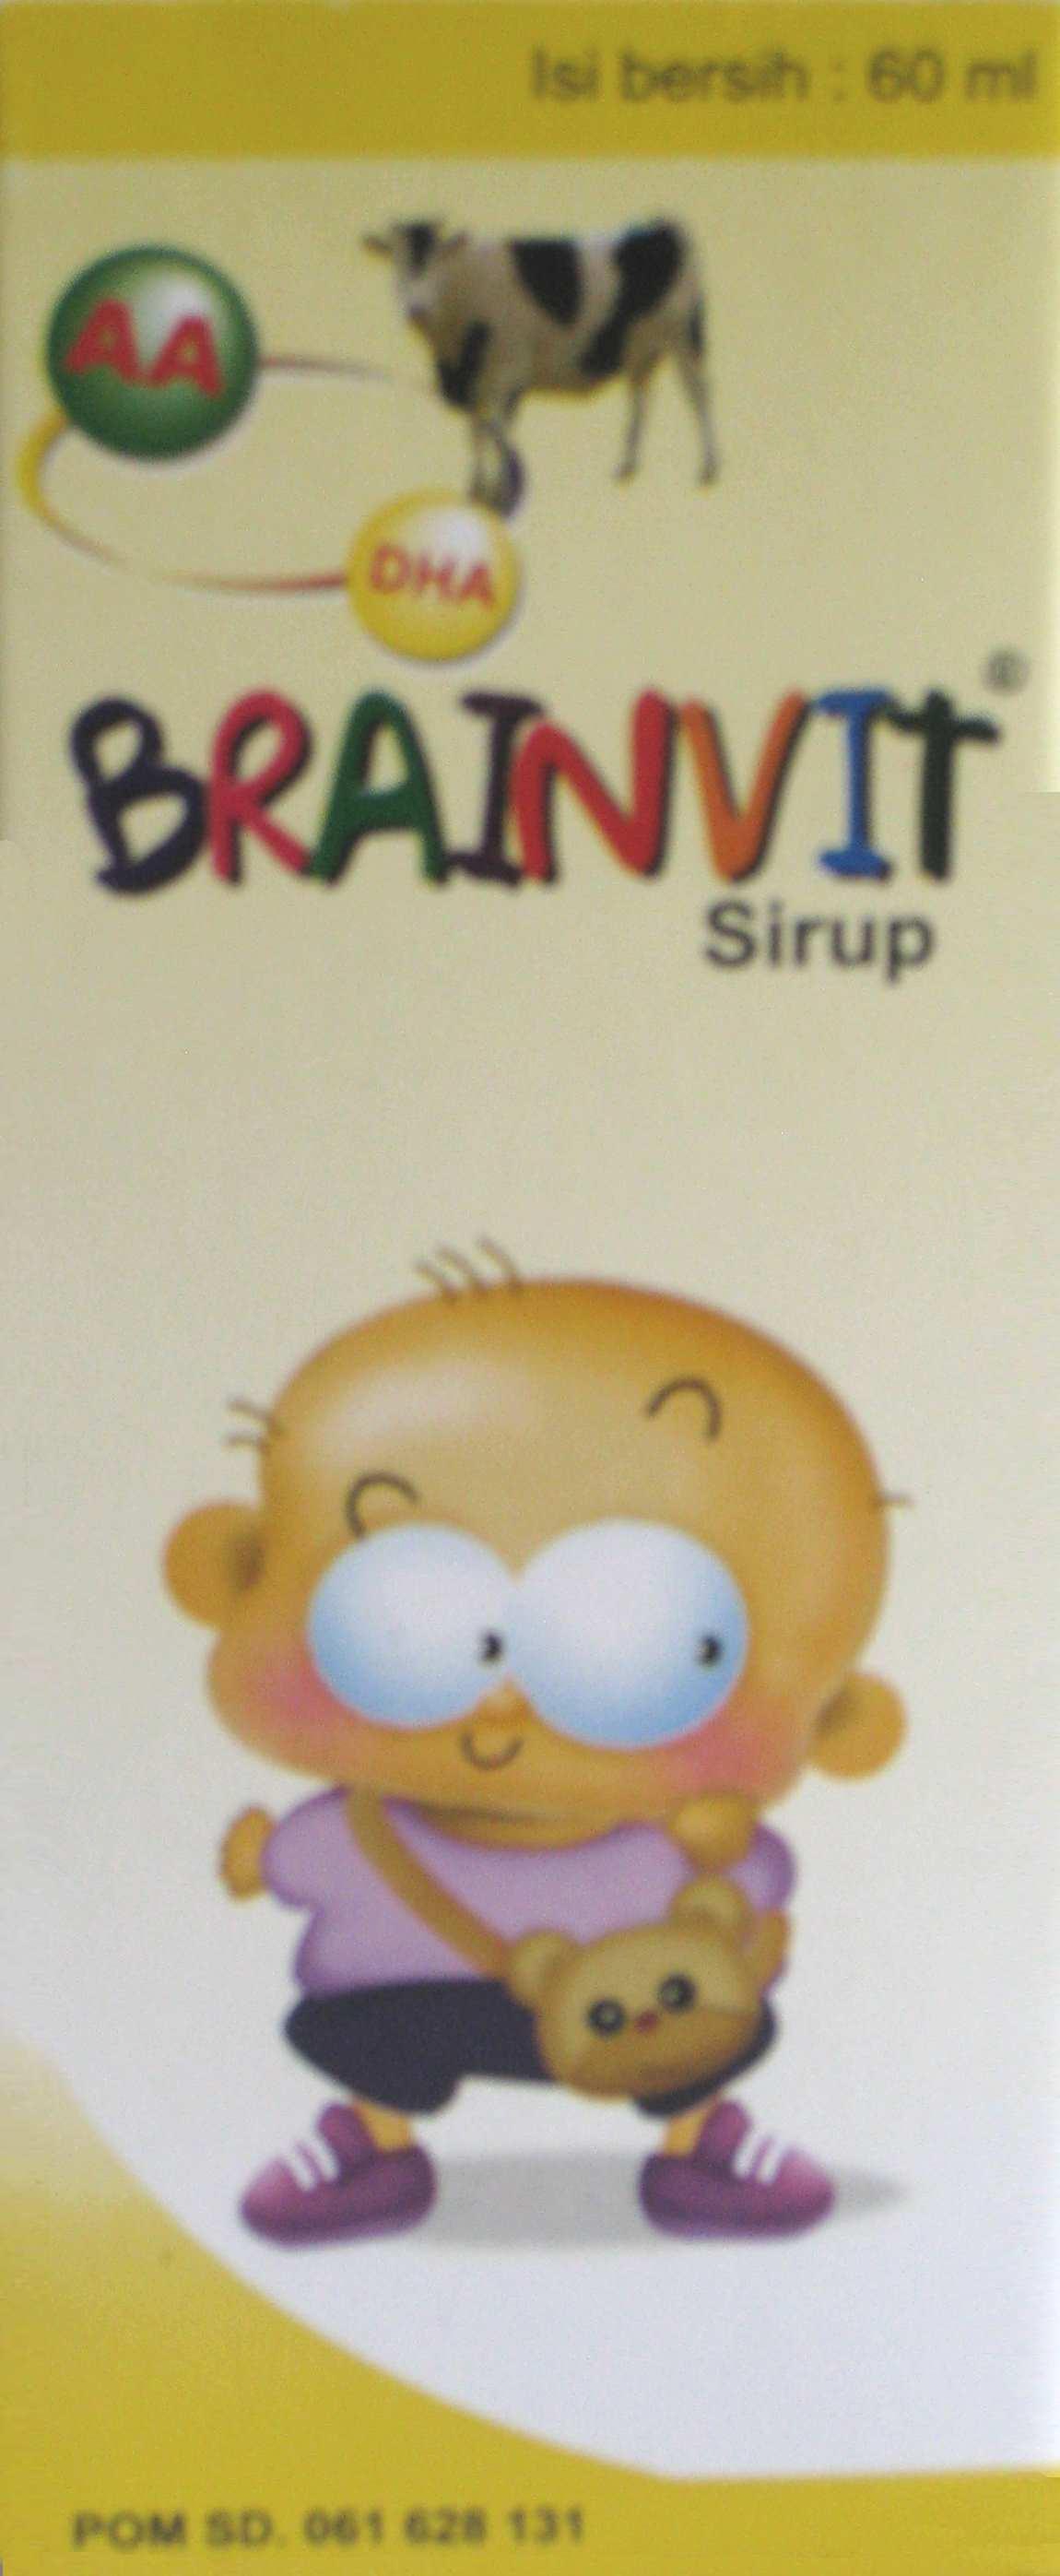 BRAINVIT SIRUP 60 ML